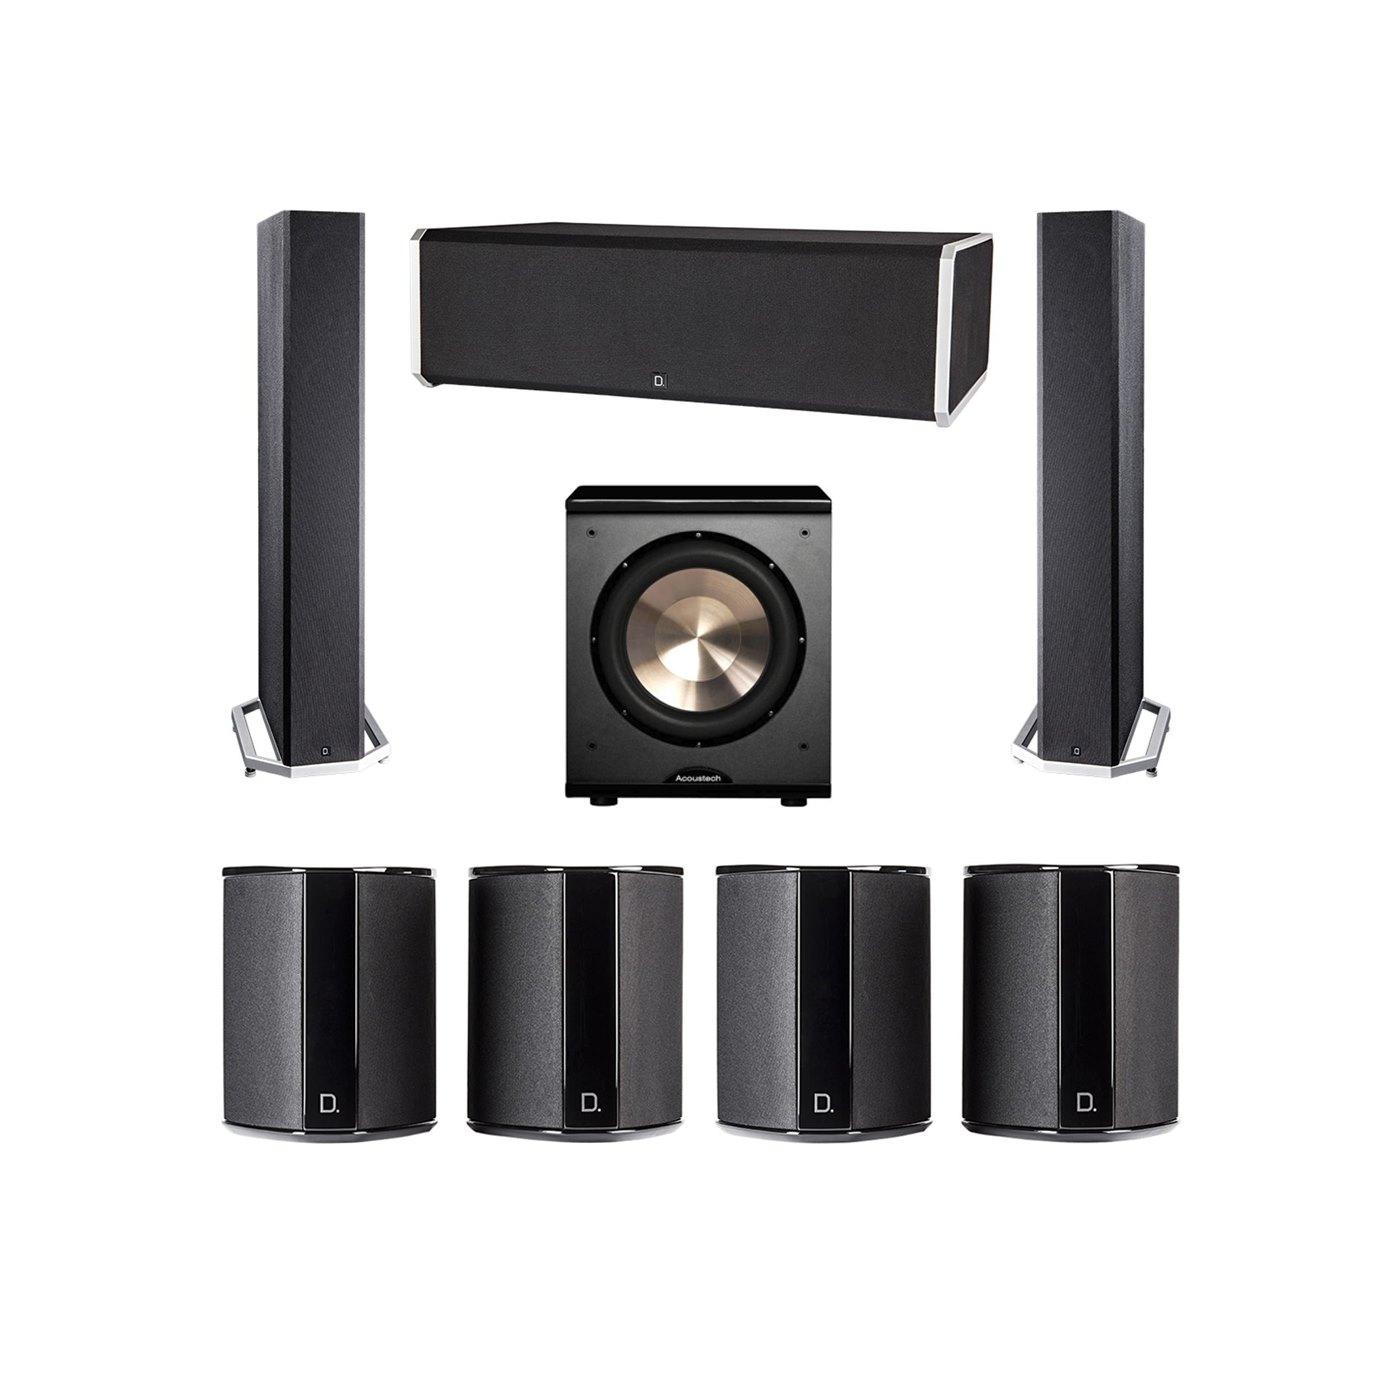 Definitive Technology 7.1 System with 2 BP9040 Tower Speakers, 1 CS9080 Center Channel Speaker, 4 SR9040 Surround Speaker, 1 BIC PL-200 Subwoofer